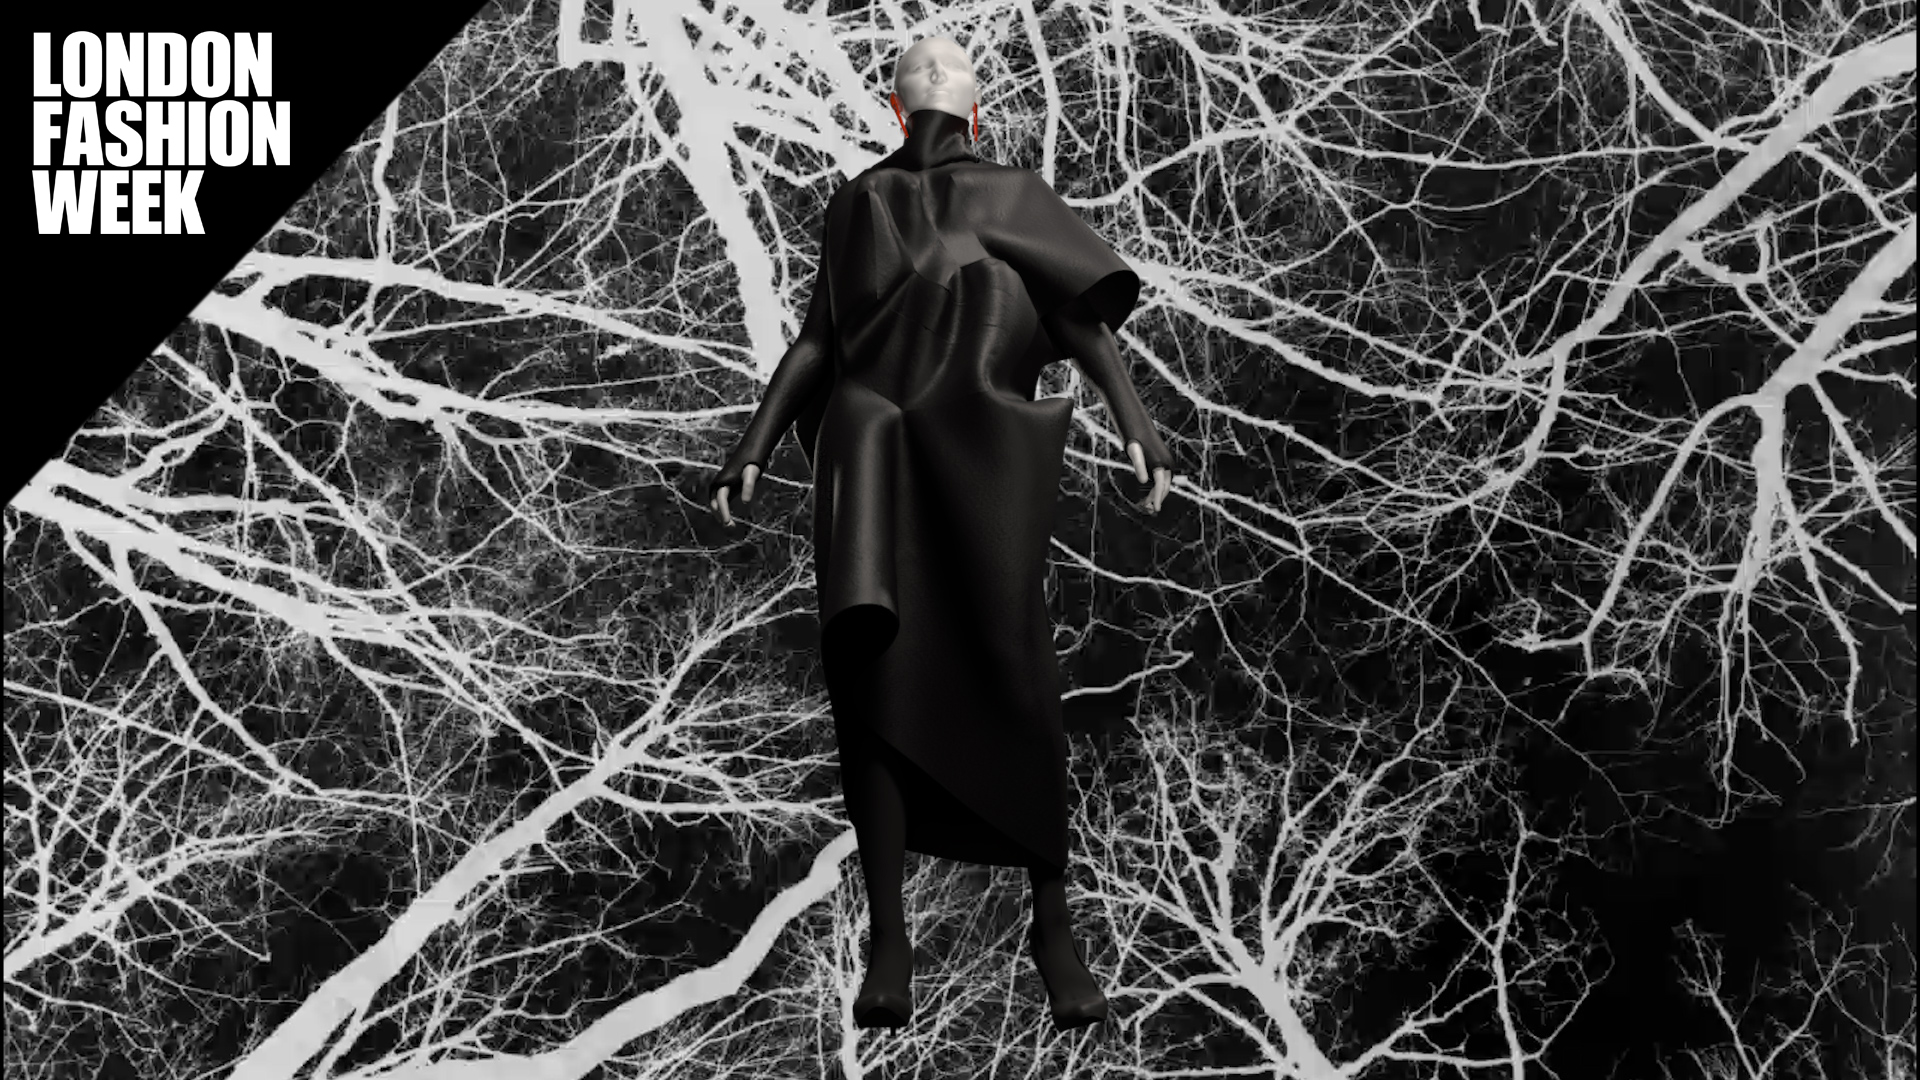 anuncio London Fashion Week 2